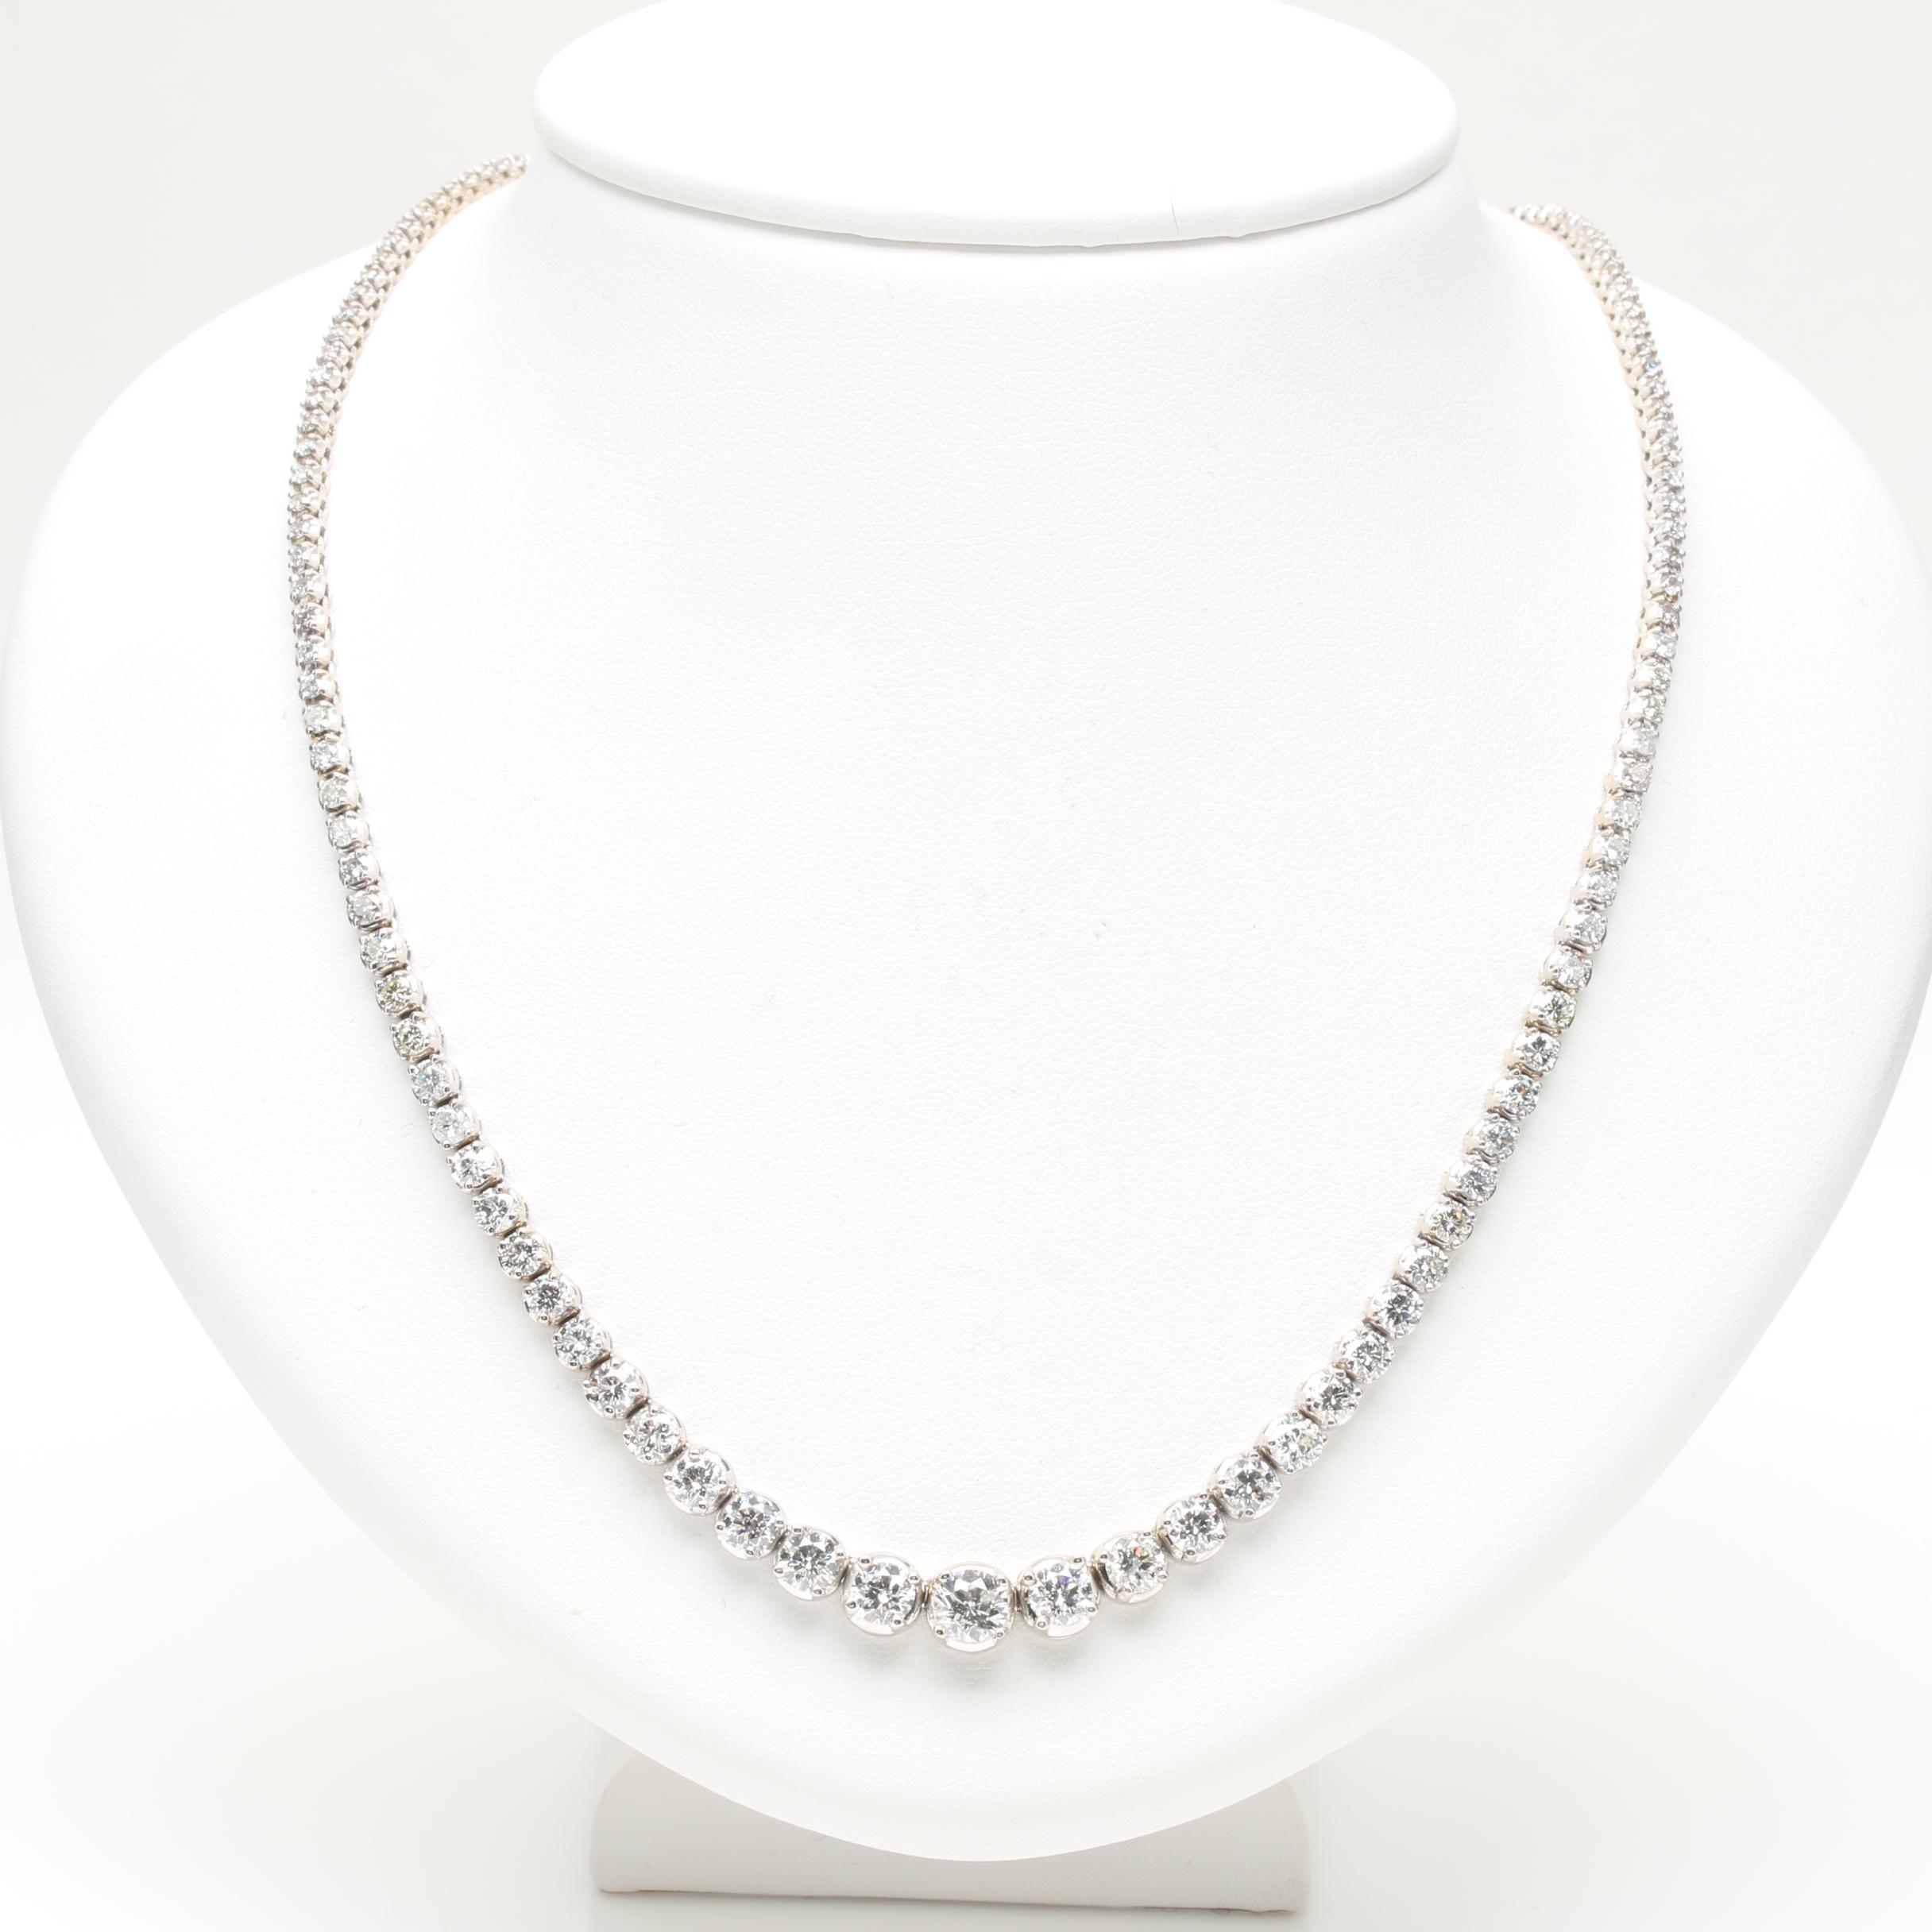 14K White Gold 11.27 CTW Diamond Riviera Necklace